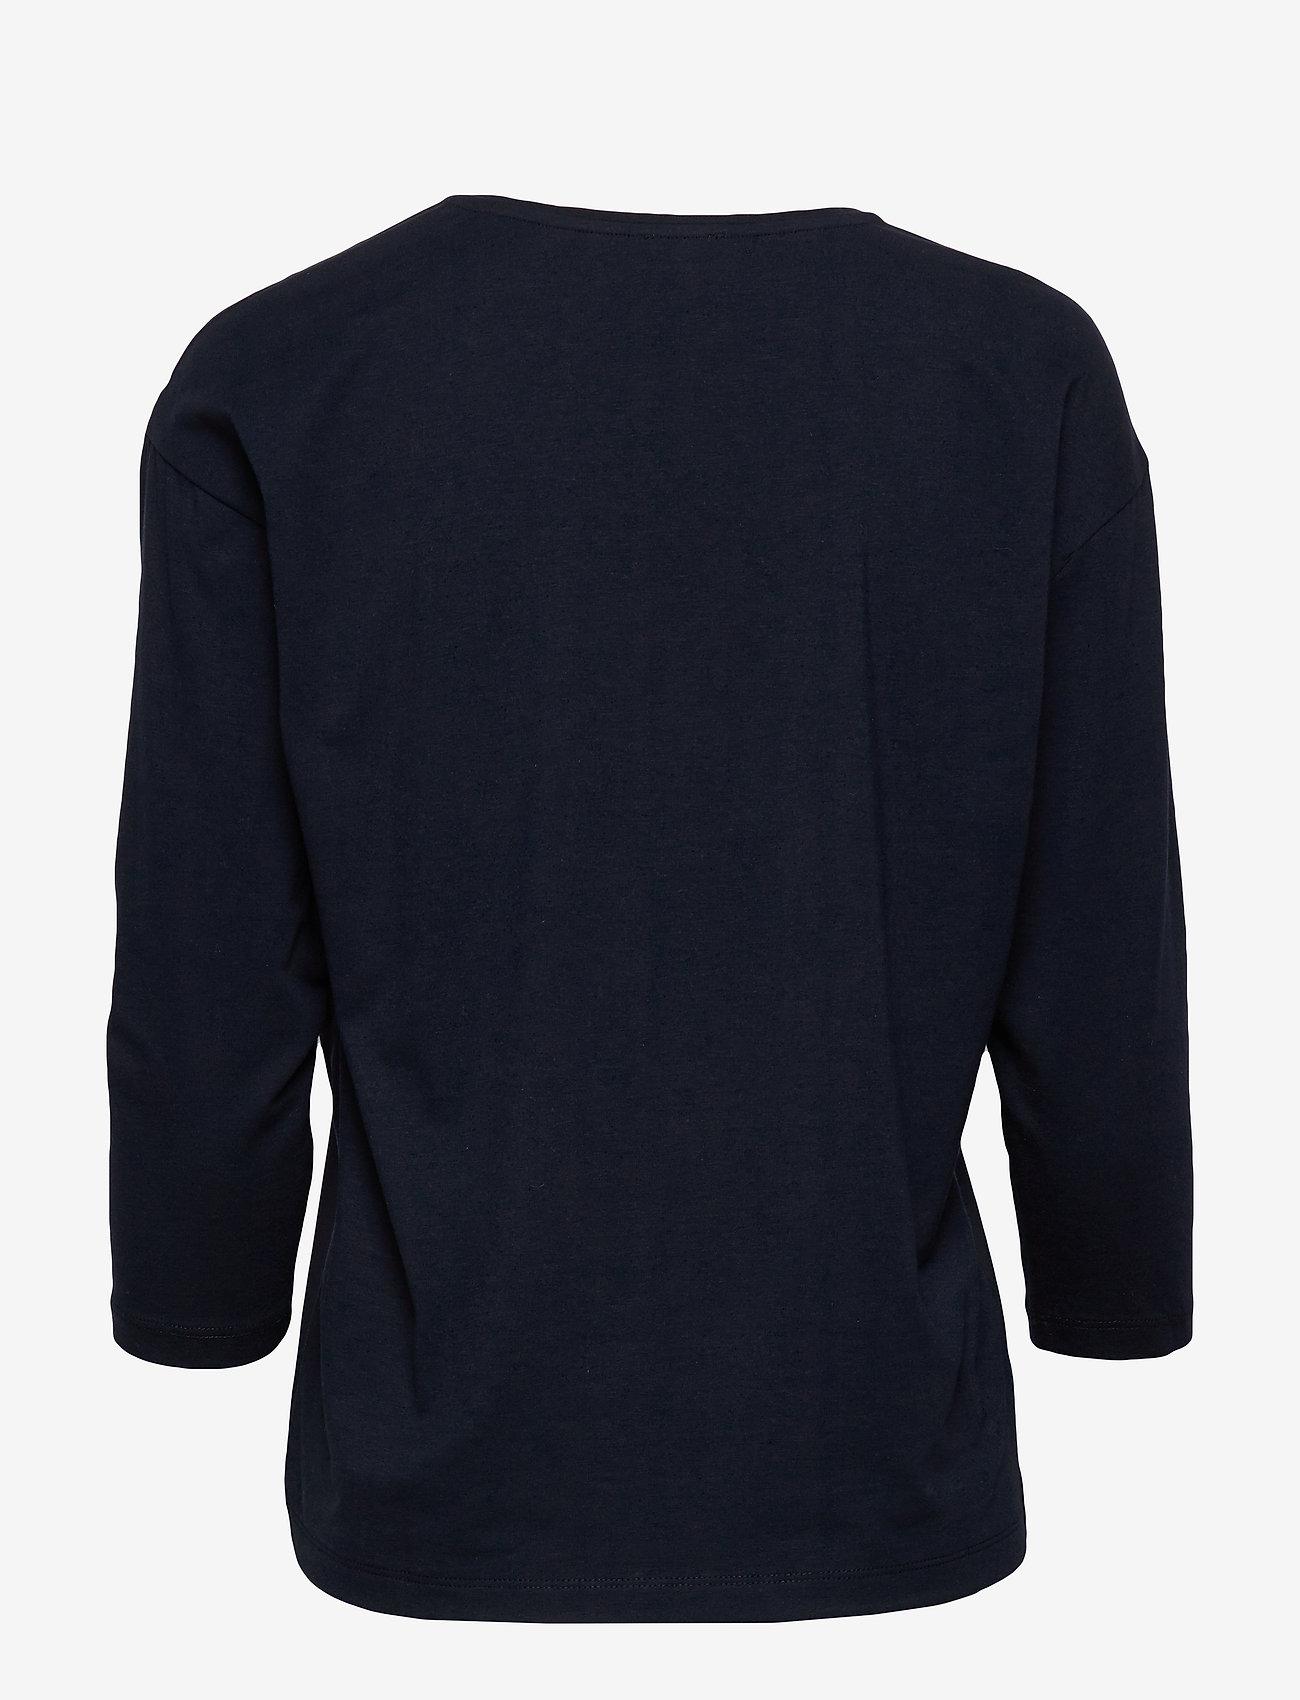 Särskild rabattT-shirt 3/4-sleeve R Blue Print 421.85 Gerry Weber bfmEX vyT93